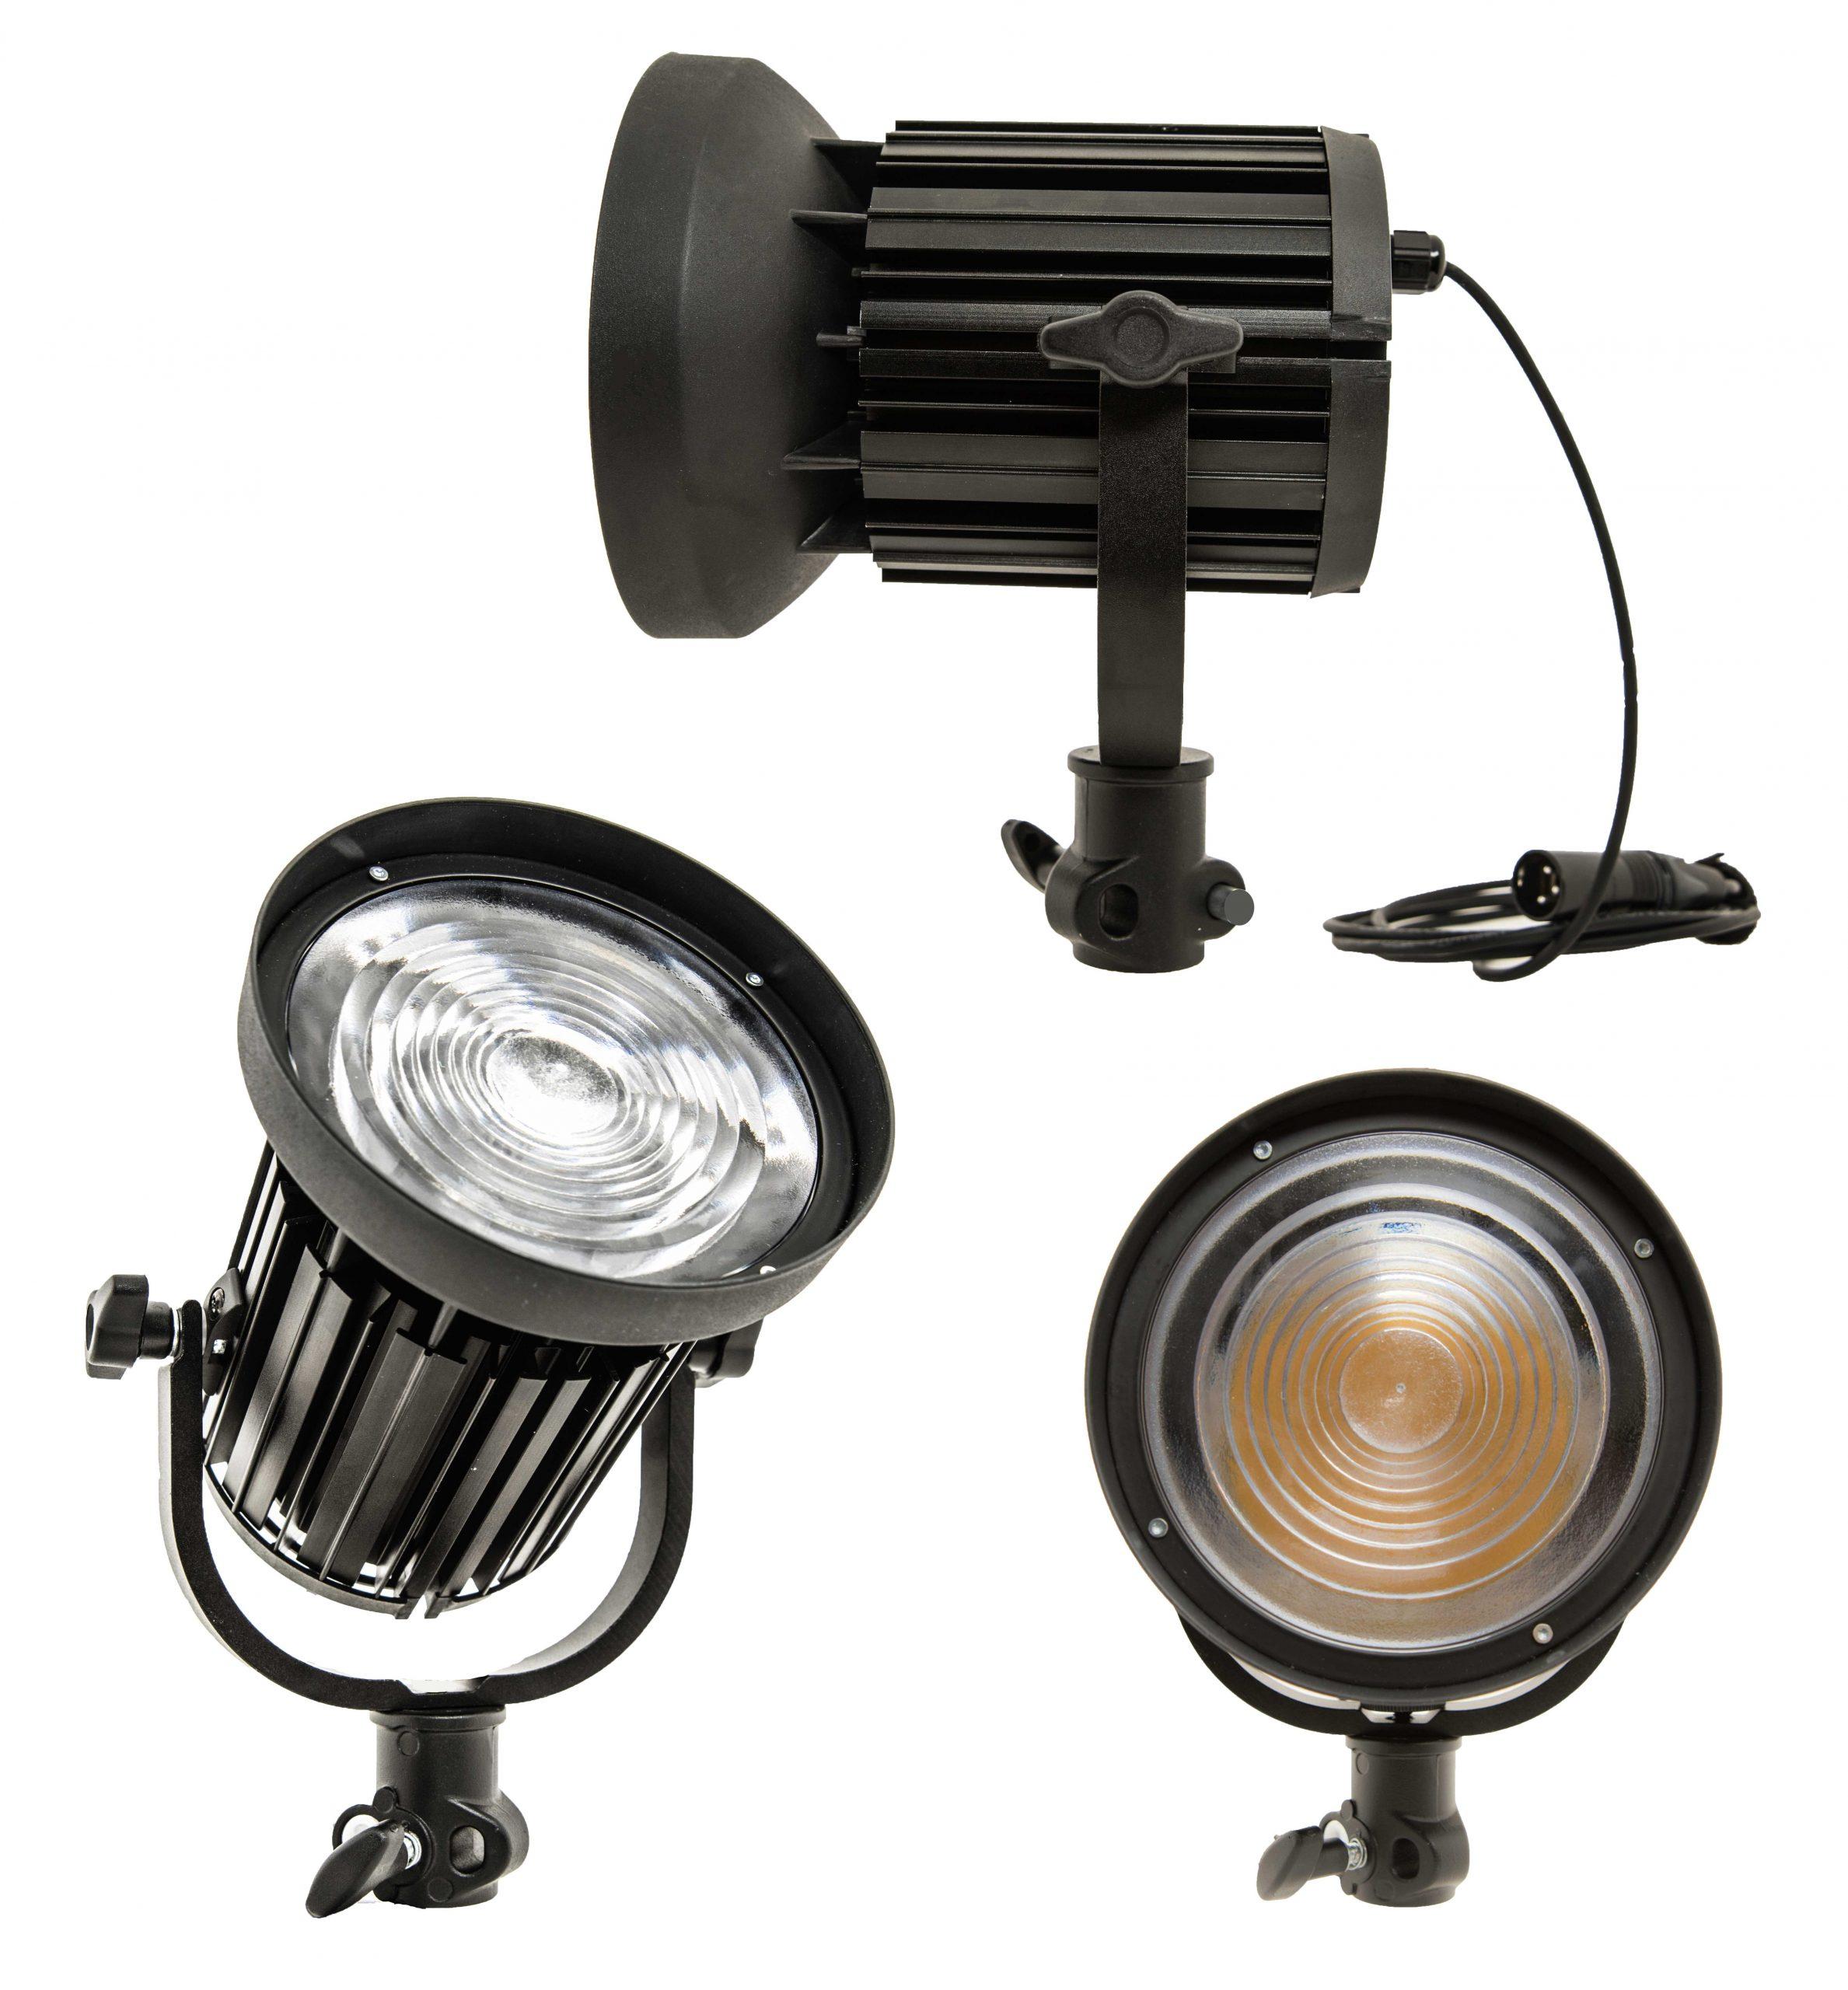 BiColor Compact Beamlight